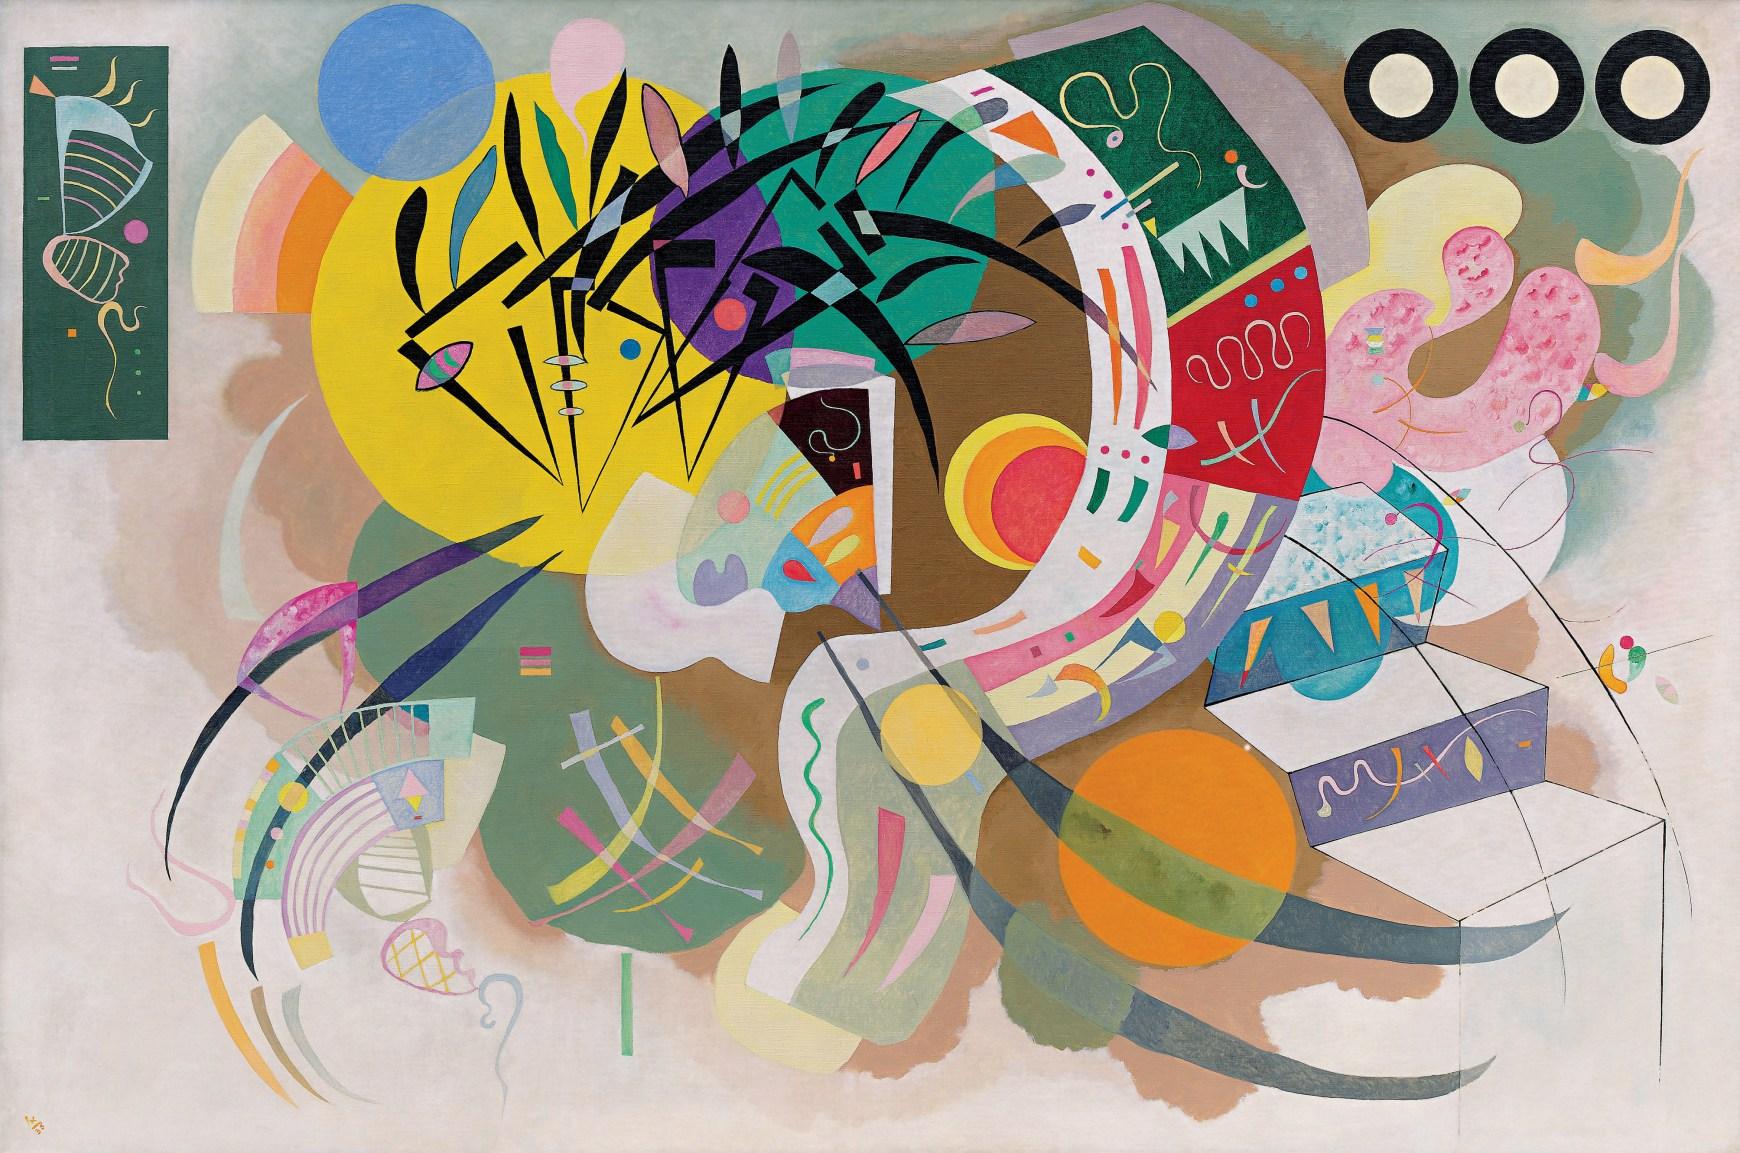 Dominant Curve, oil on canvas, Vassily Kandinsky,1936, (Image courtesy of Solomon R. Guggenheim Museum, New York, Solomon R. Guggenheim Founding Collection)